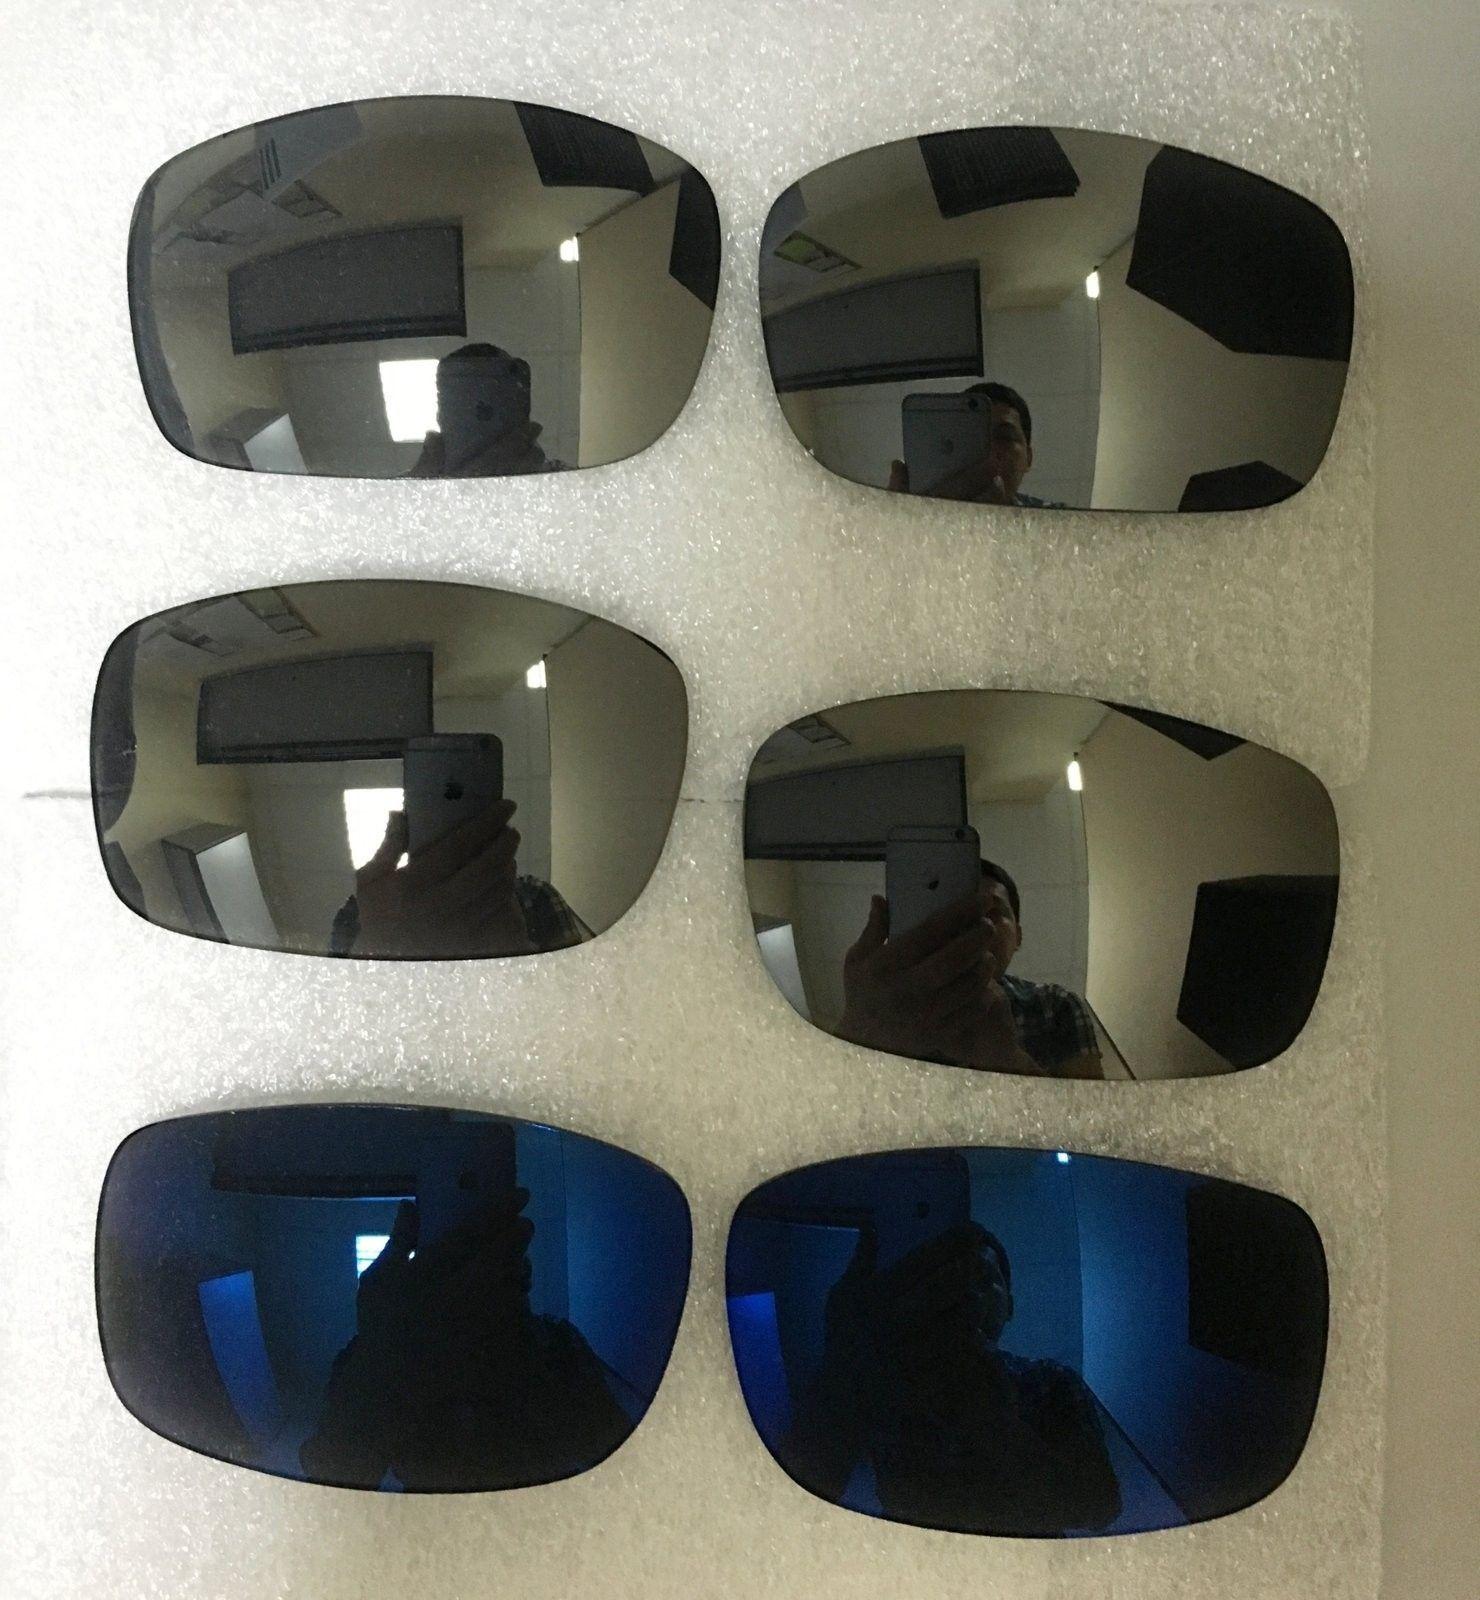 Box for XS Plasma/Ice, XS OEM lenses, XS OEM rubbers - image (3).jpeg